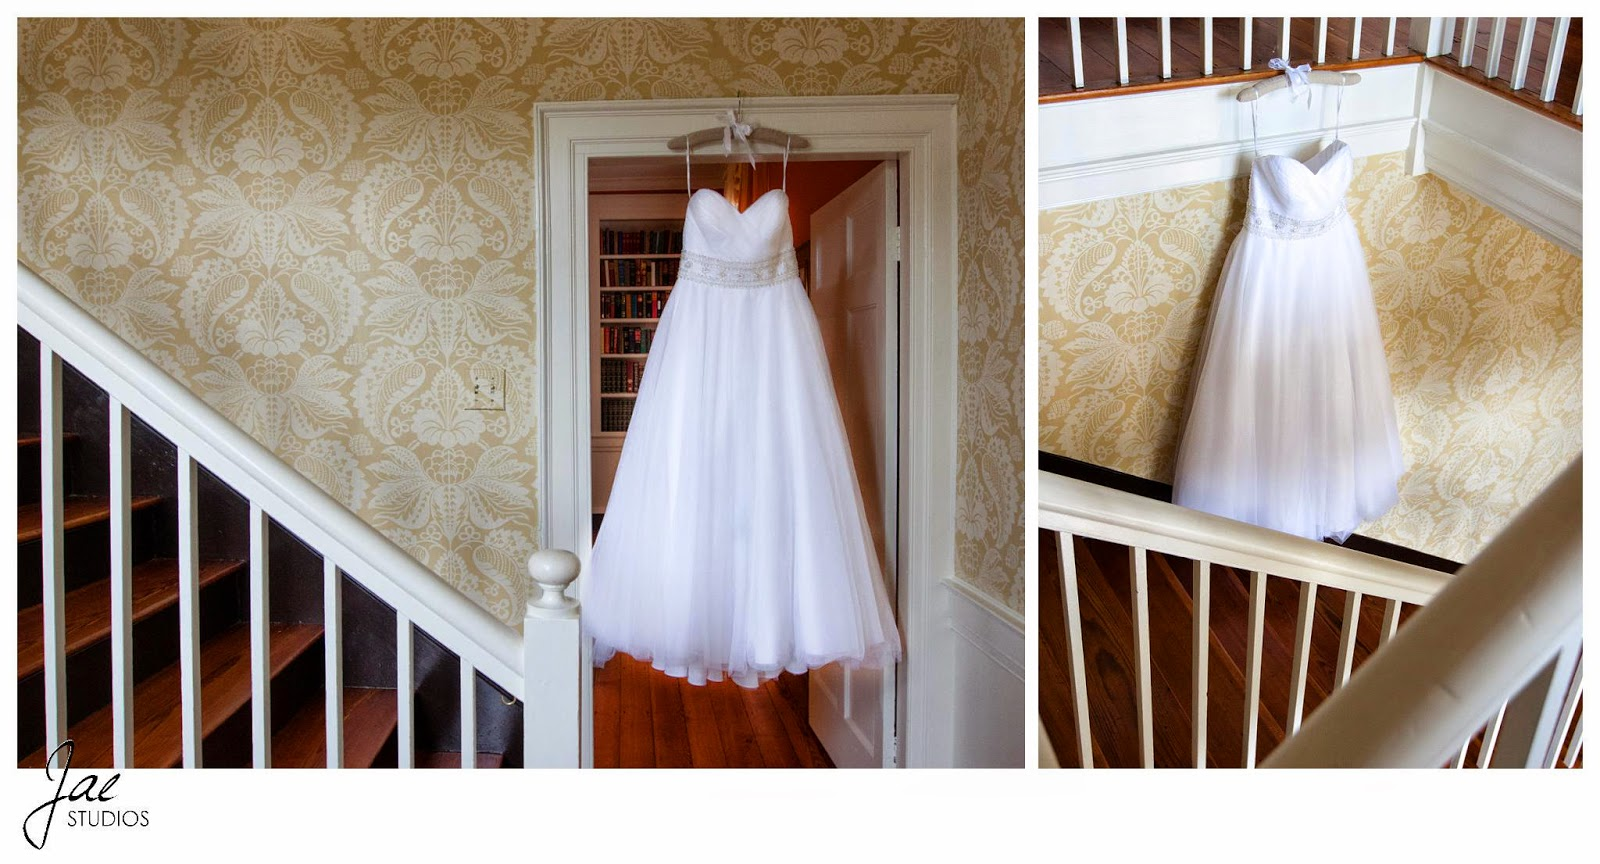 Jonathan and Julie, Bird cage, West Manor Estate, Wedding, Lynchburg, Virginia, Jae Studios, wedding dress, stairs, red, white, patterned, wallpaper, hanging